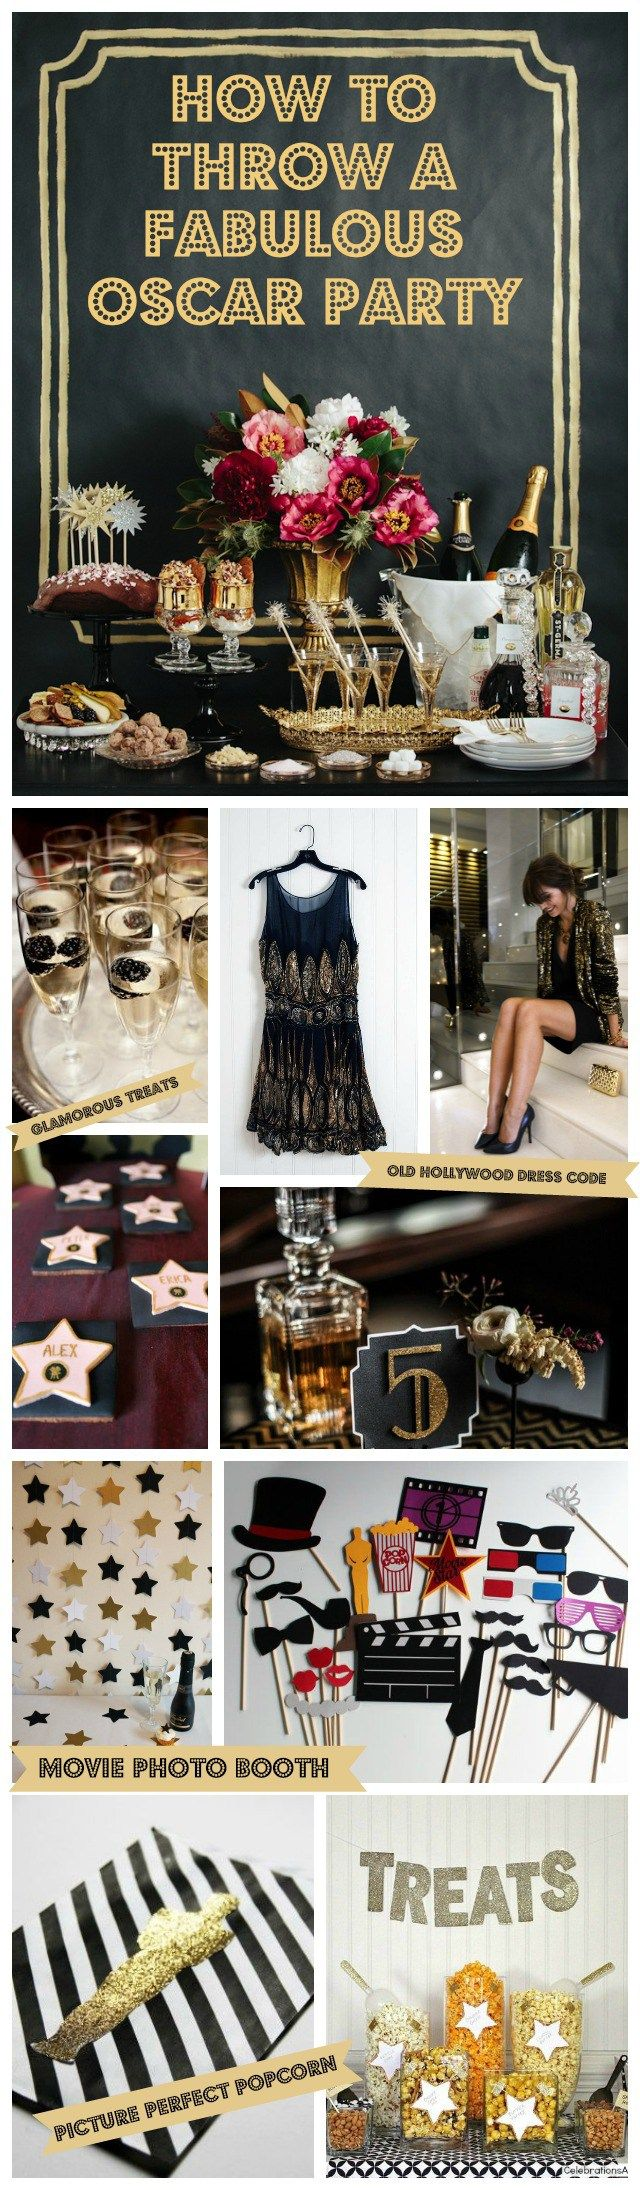 Black and Gold Party Ideas Academy  Oscar Golden Globes Awards Party Ideas